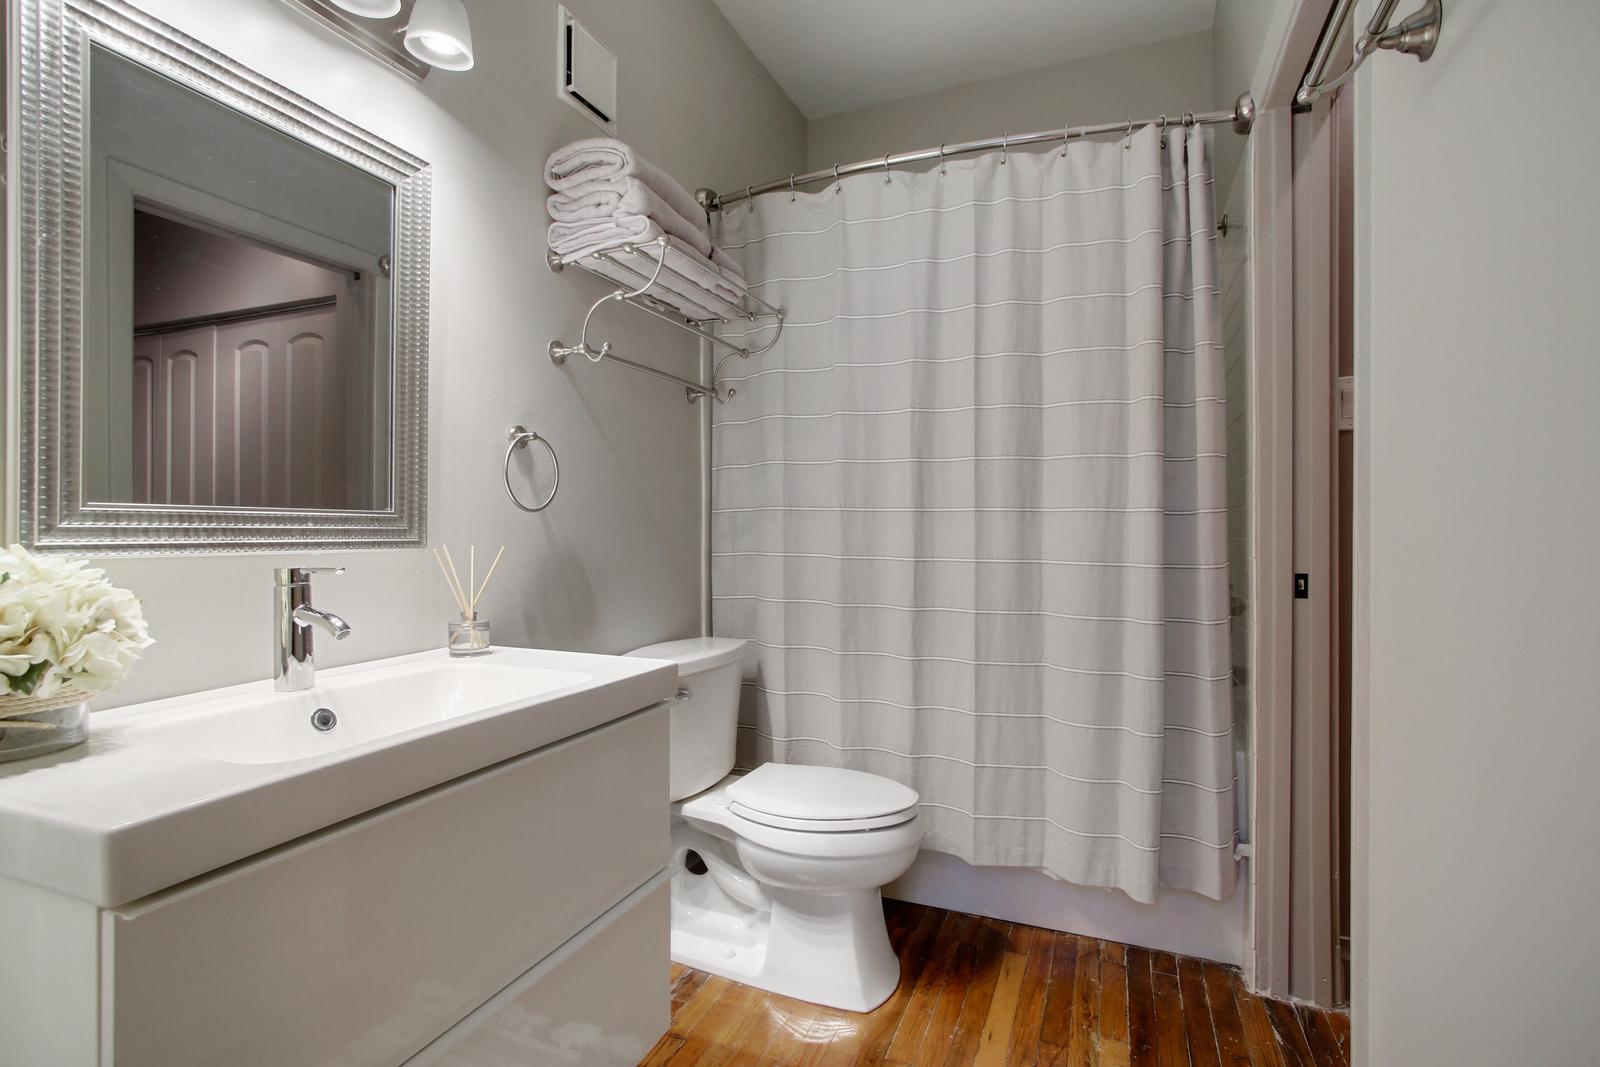 CBD/Warehouse District/South Market, Condo, 1 beds, 1.0 baths, $2800 per month New Orleans Rental - devie image_9